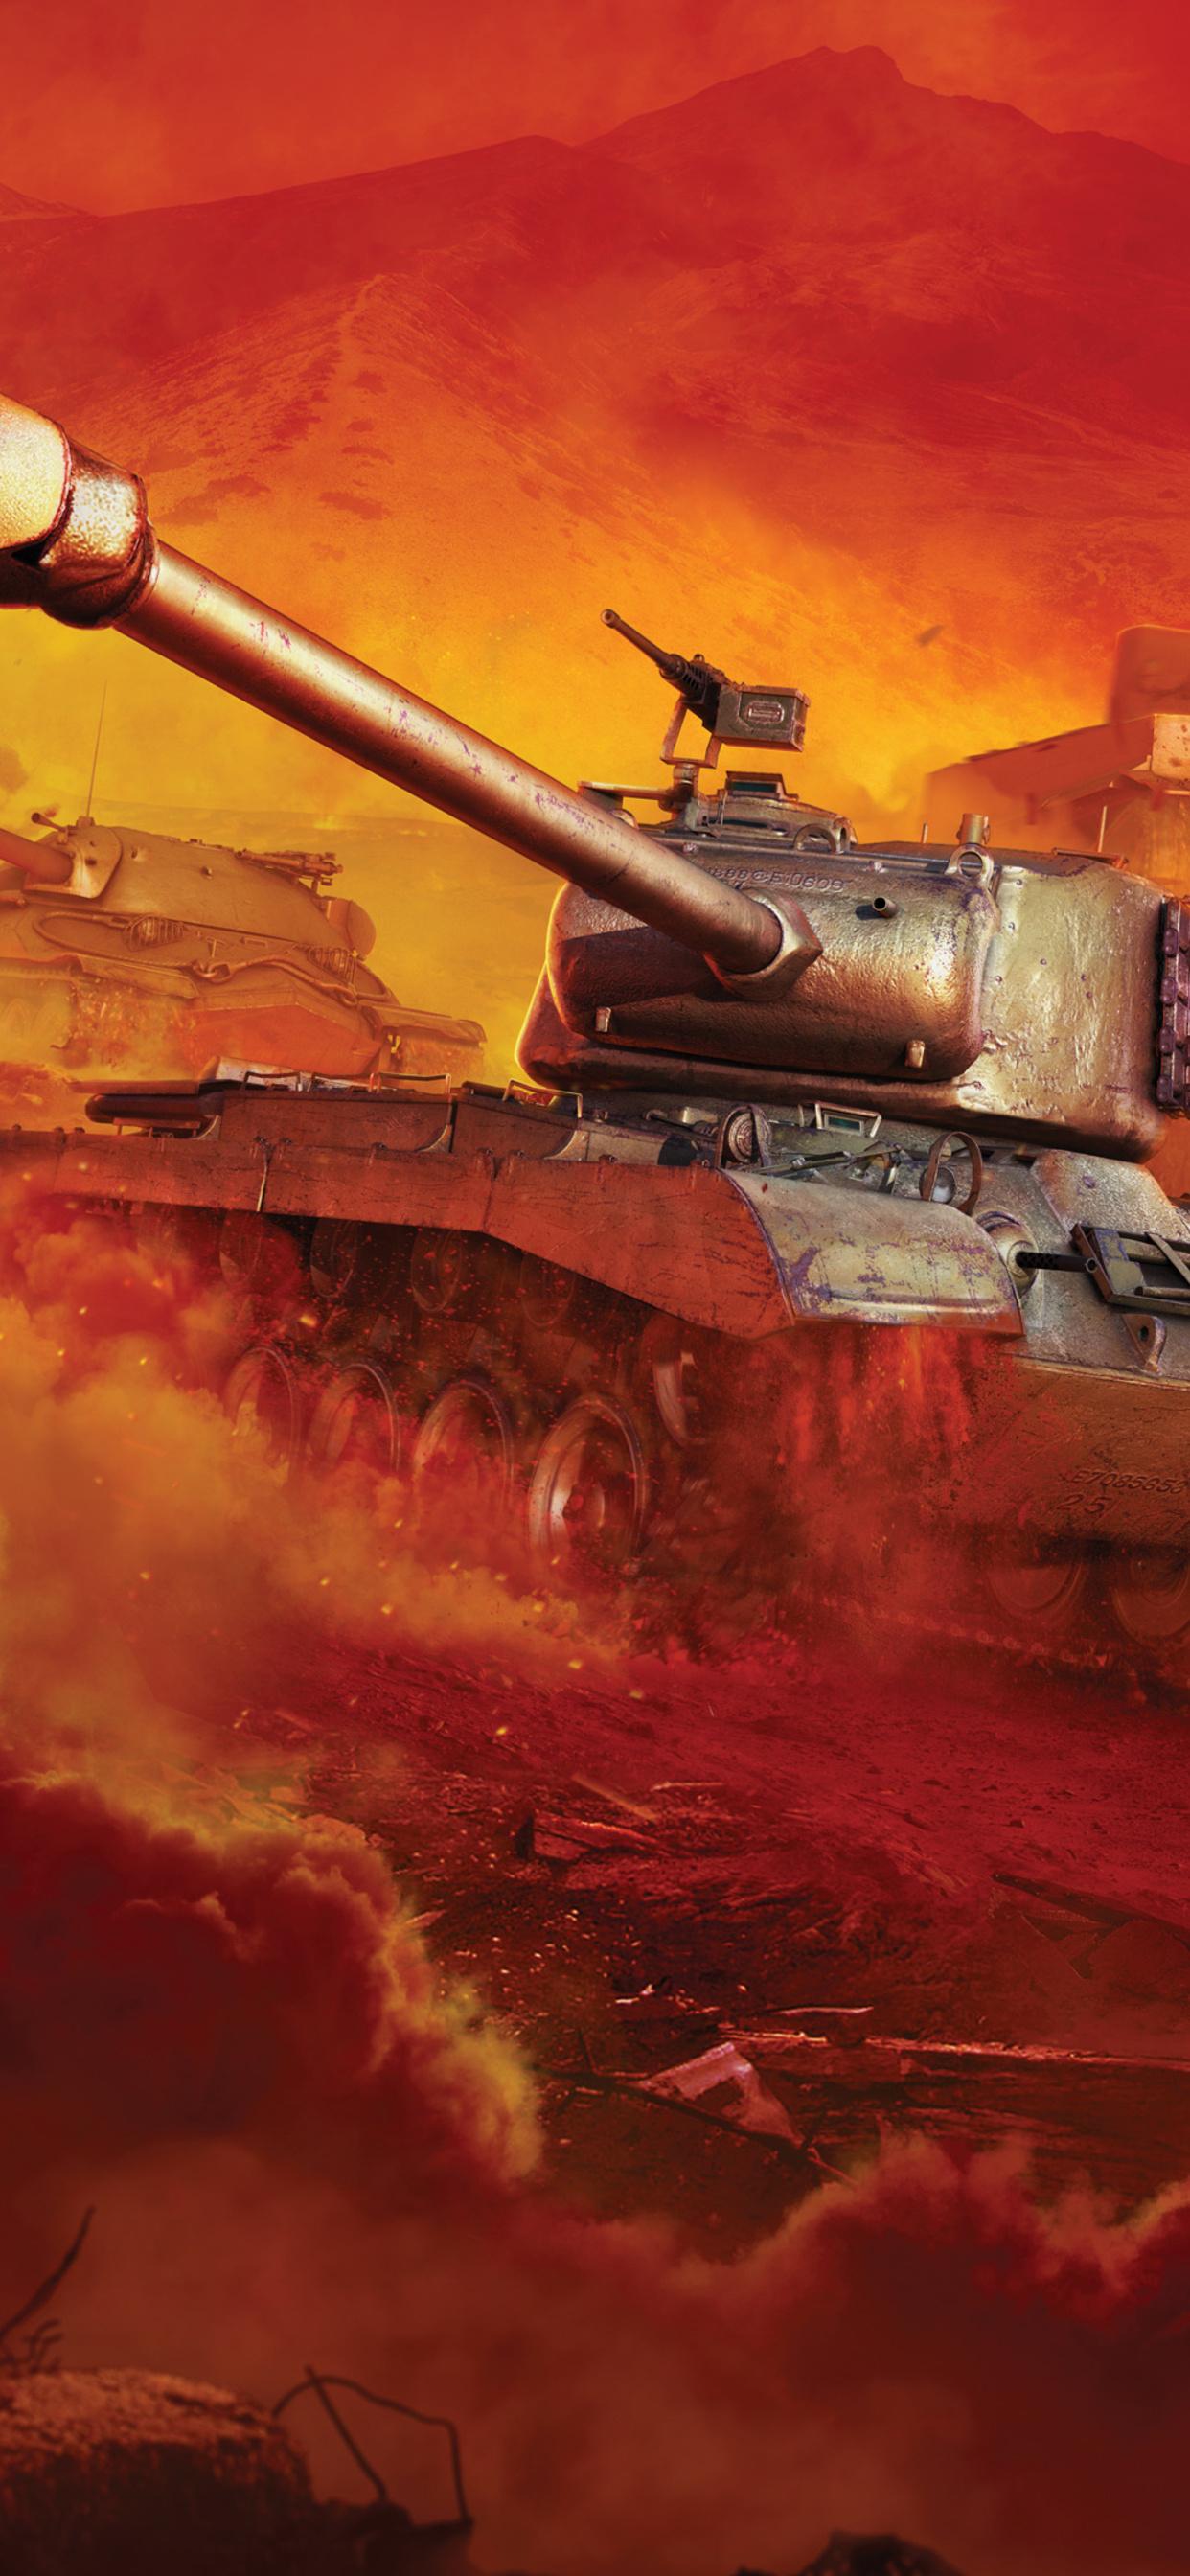 1242x2688 World Of Tanks Game 4k Iphone Xs Max Hd 4k